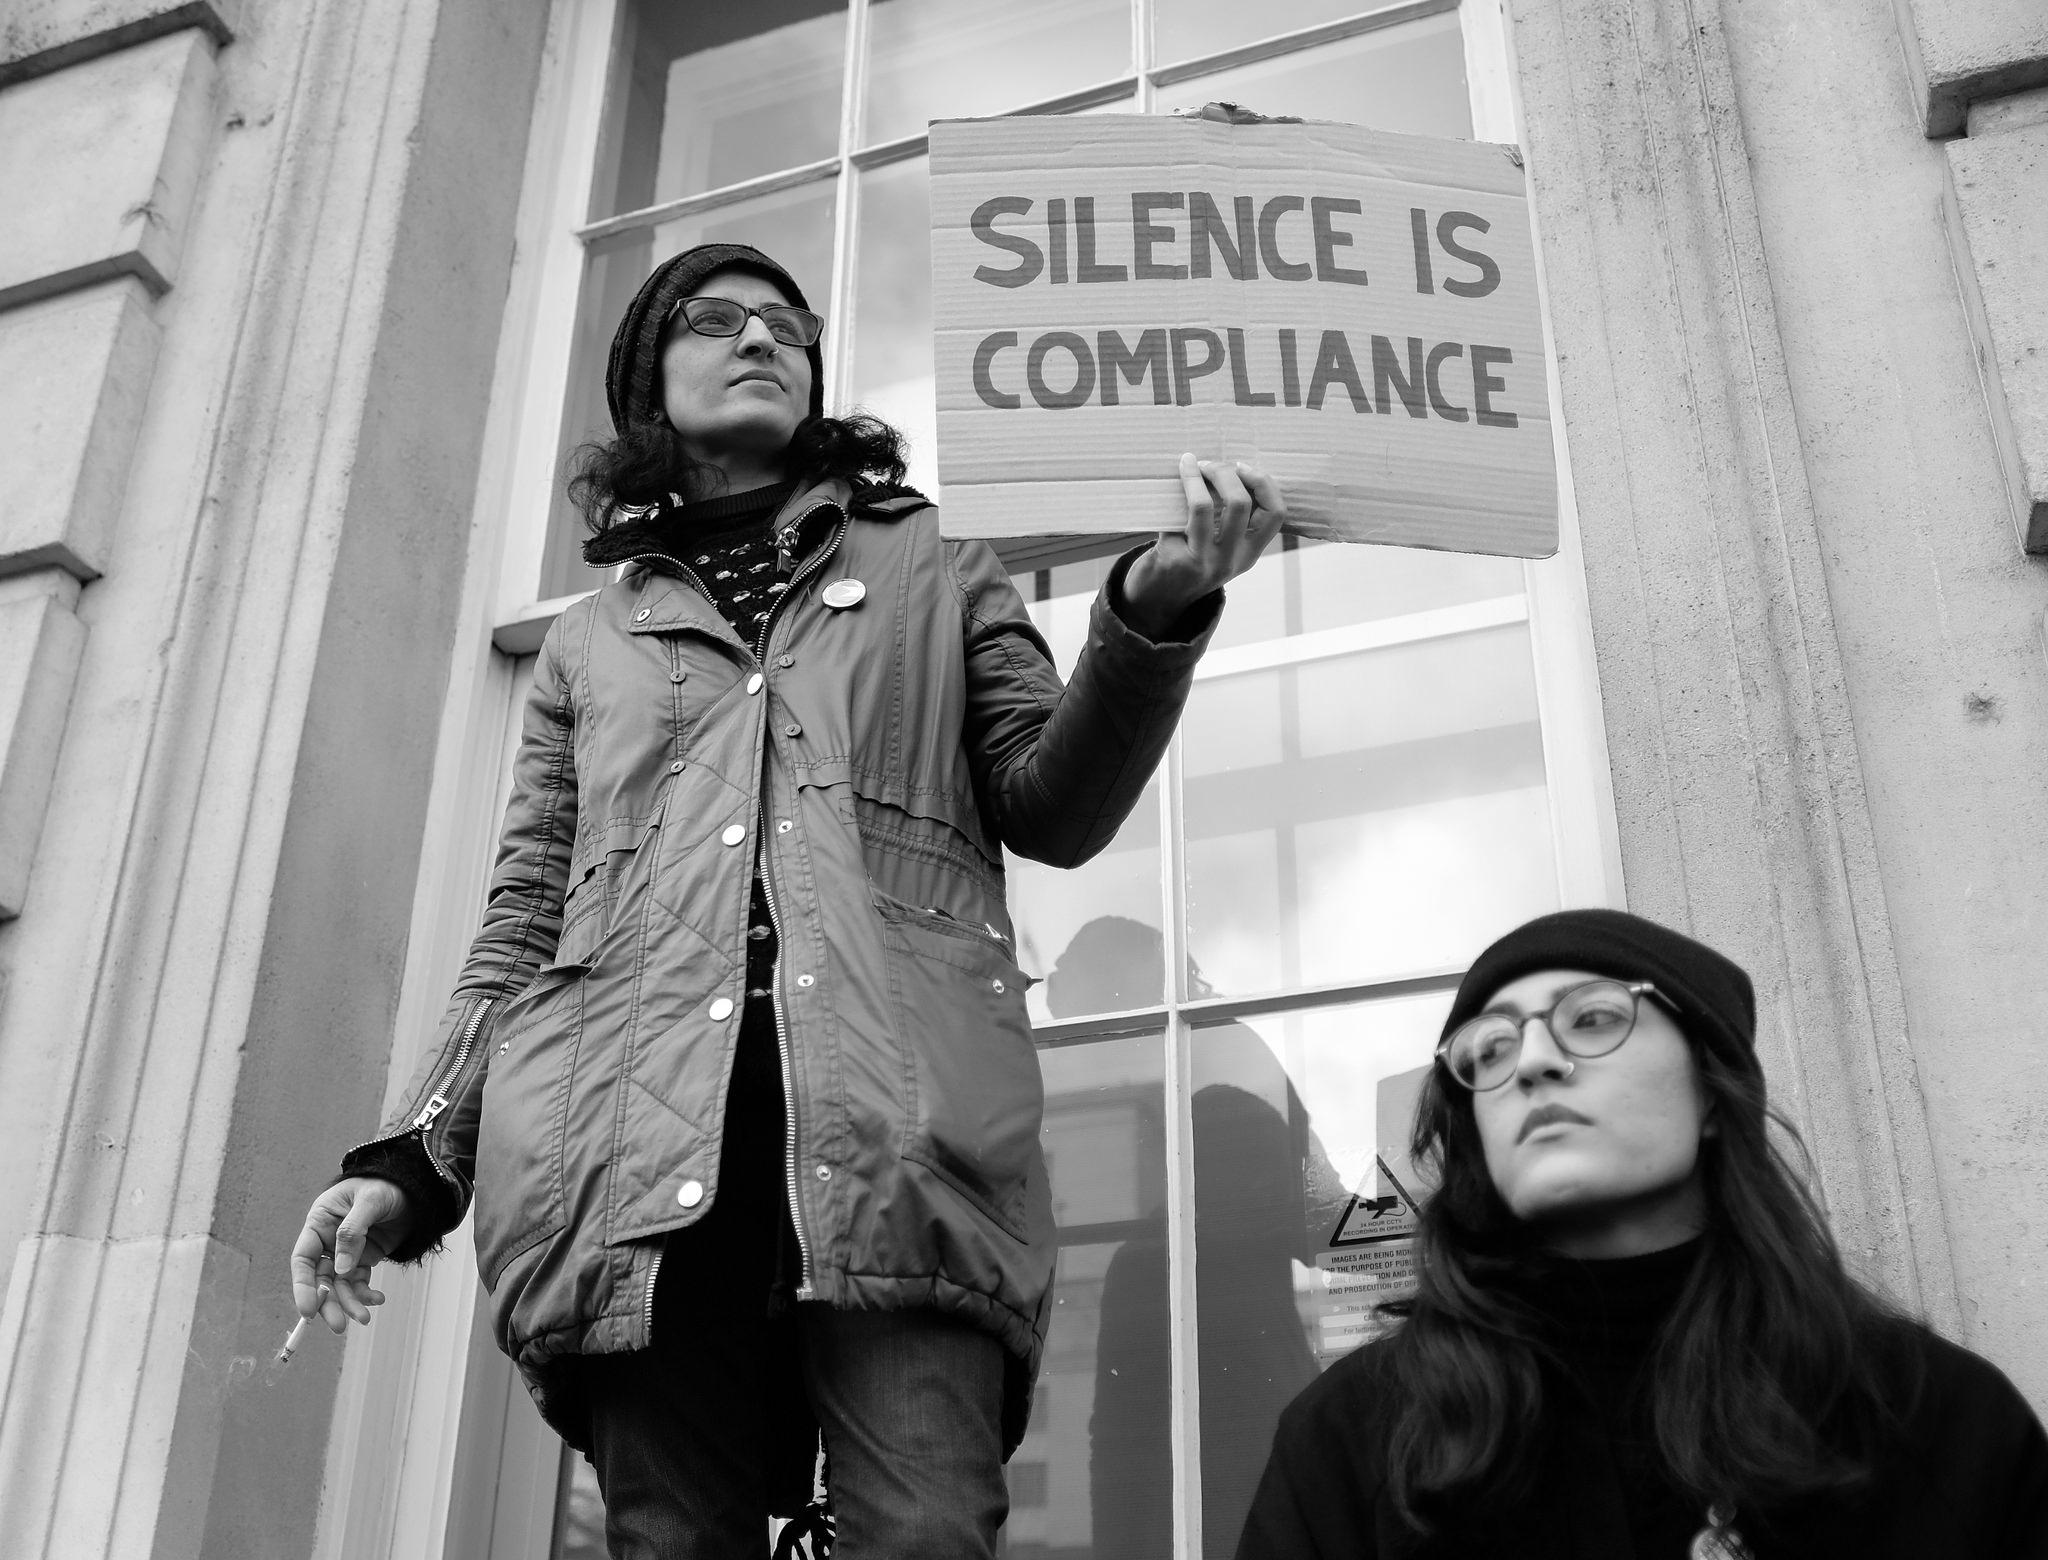 x-2banner-Silence Is Compliance-Alisdare Hickson.jpg